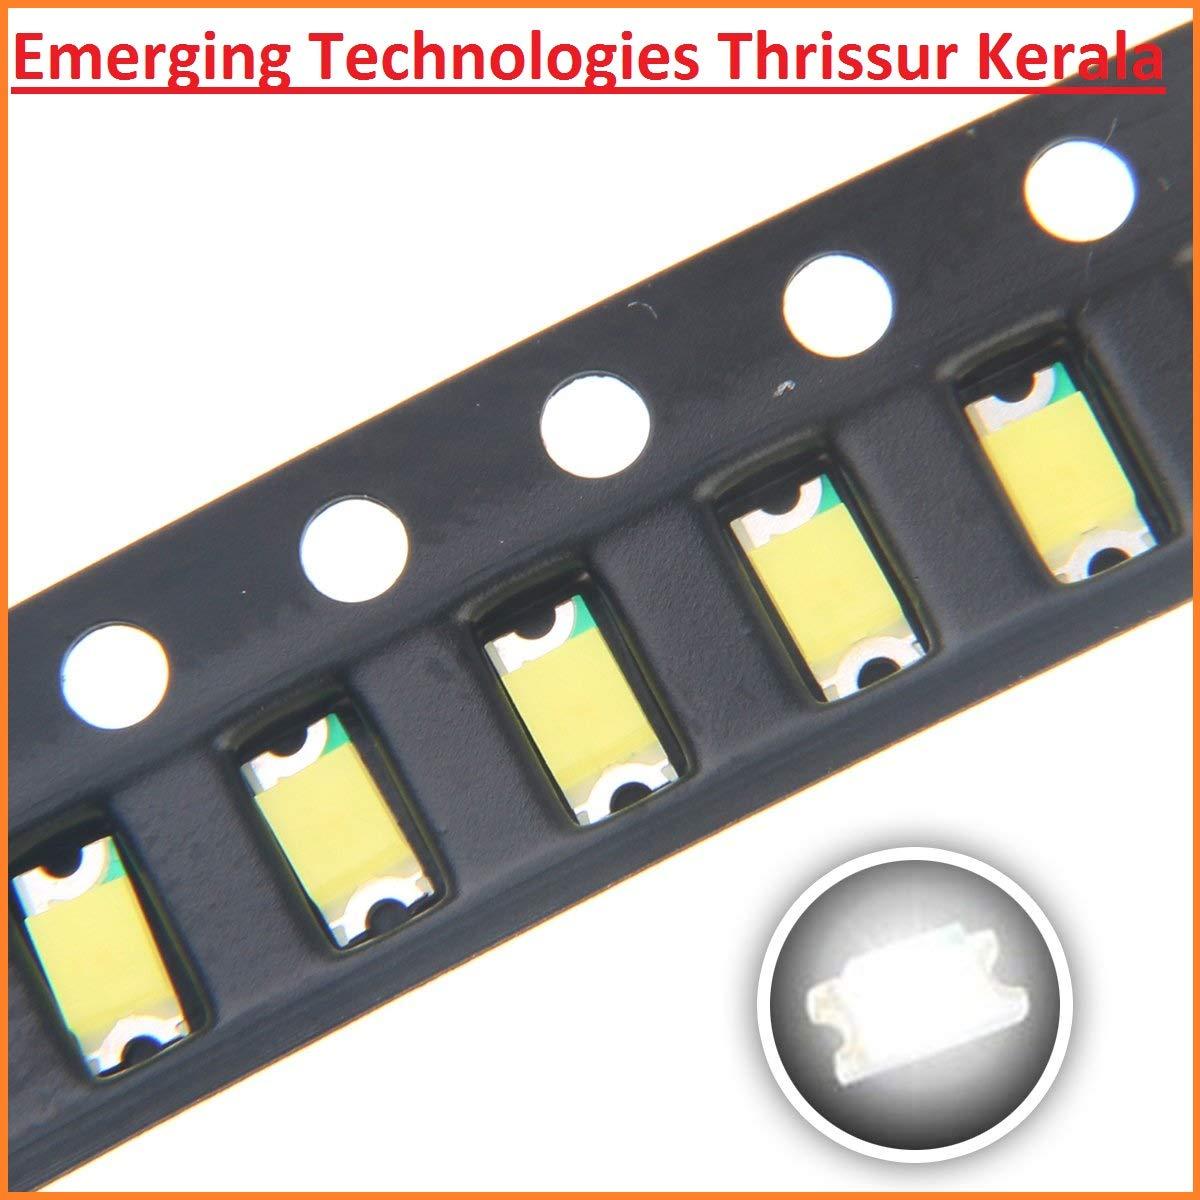 50PCS Super Bright Yellow SMD LED 1206 3.2mm×1.6mm NEW